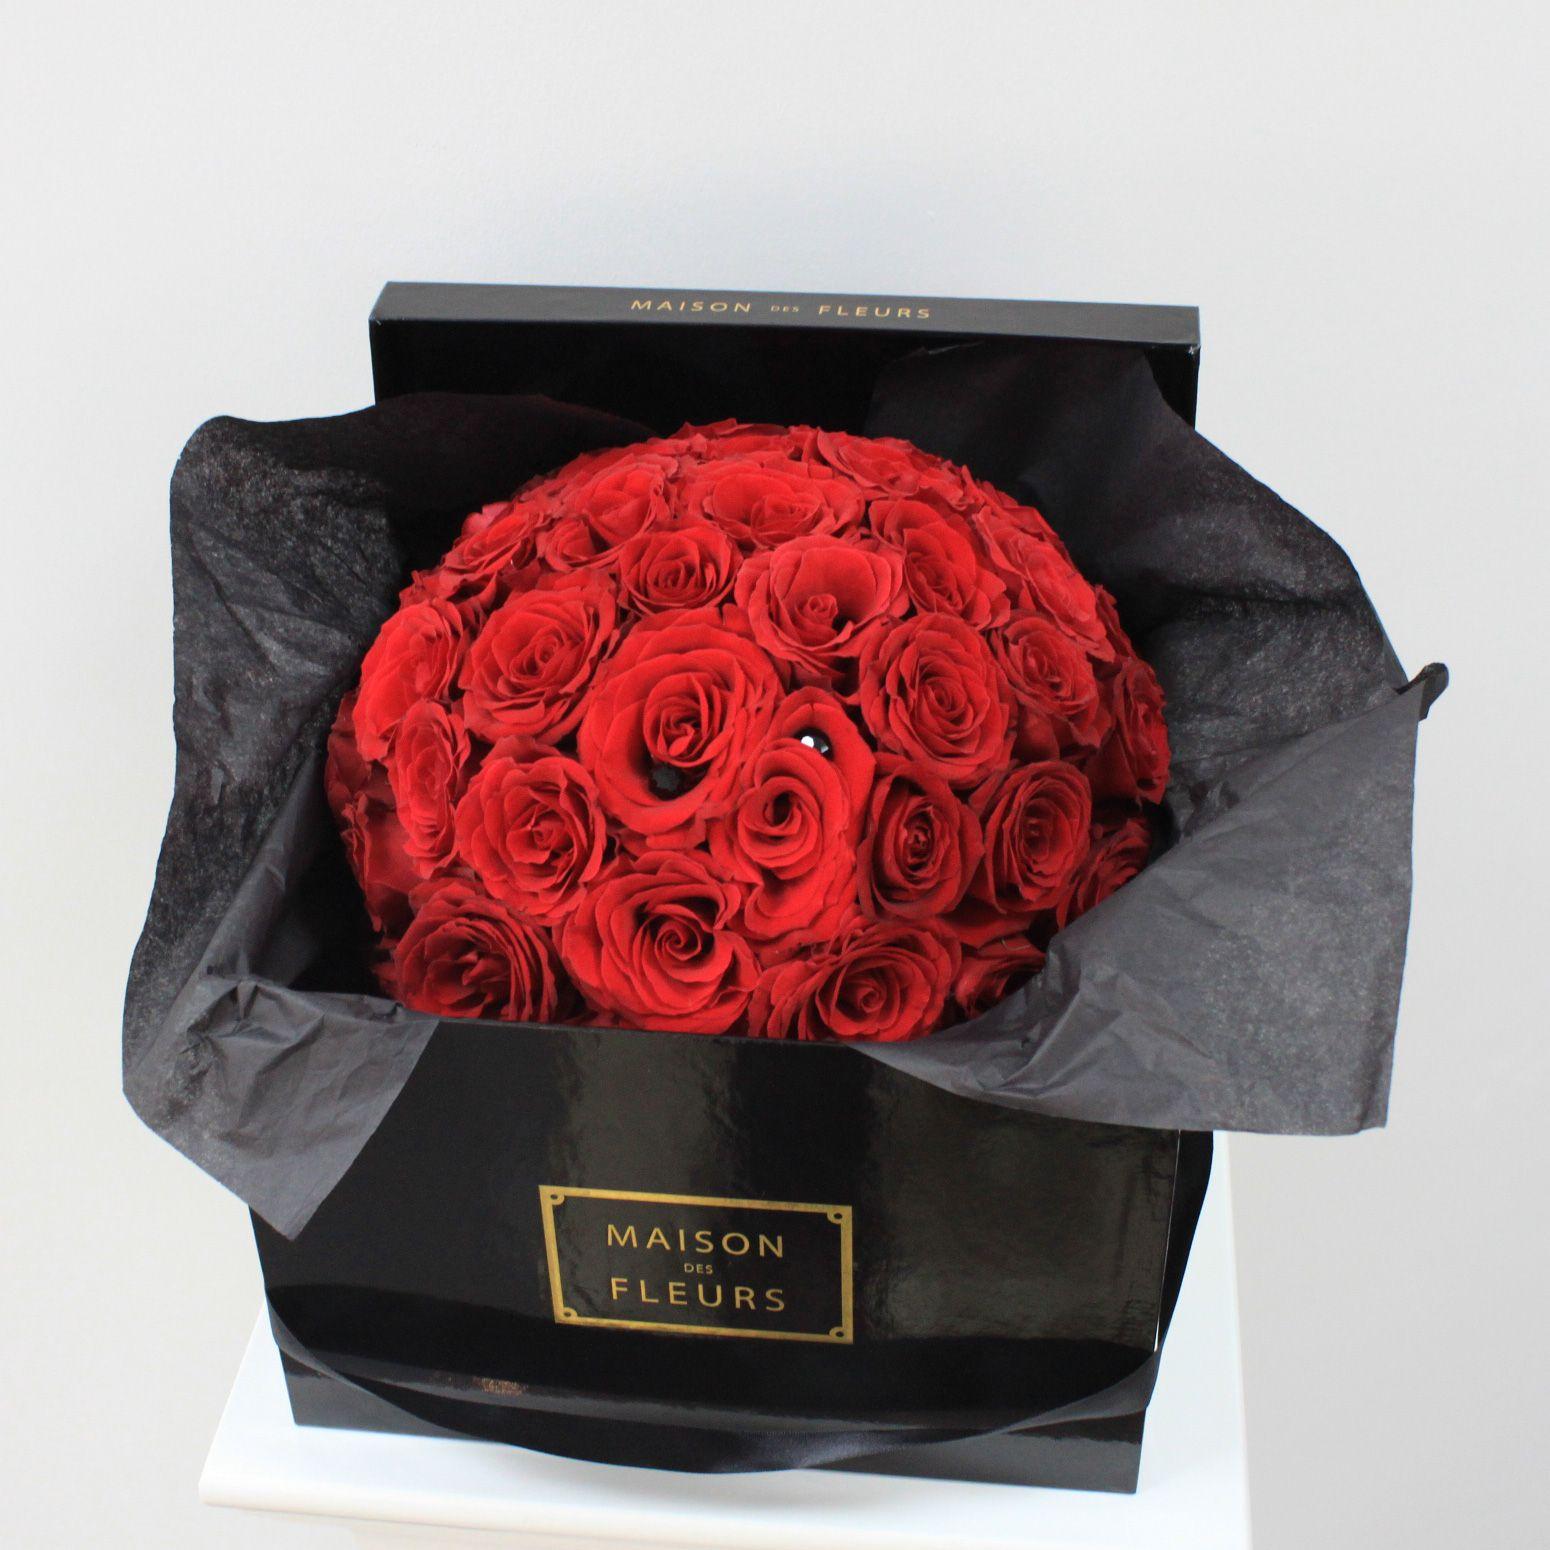 rose ball maison des fleurs flowers pinterest best flowers and flower ideas. Black Bedroom Furniture Sets. Home Design Ideas